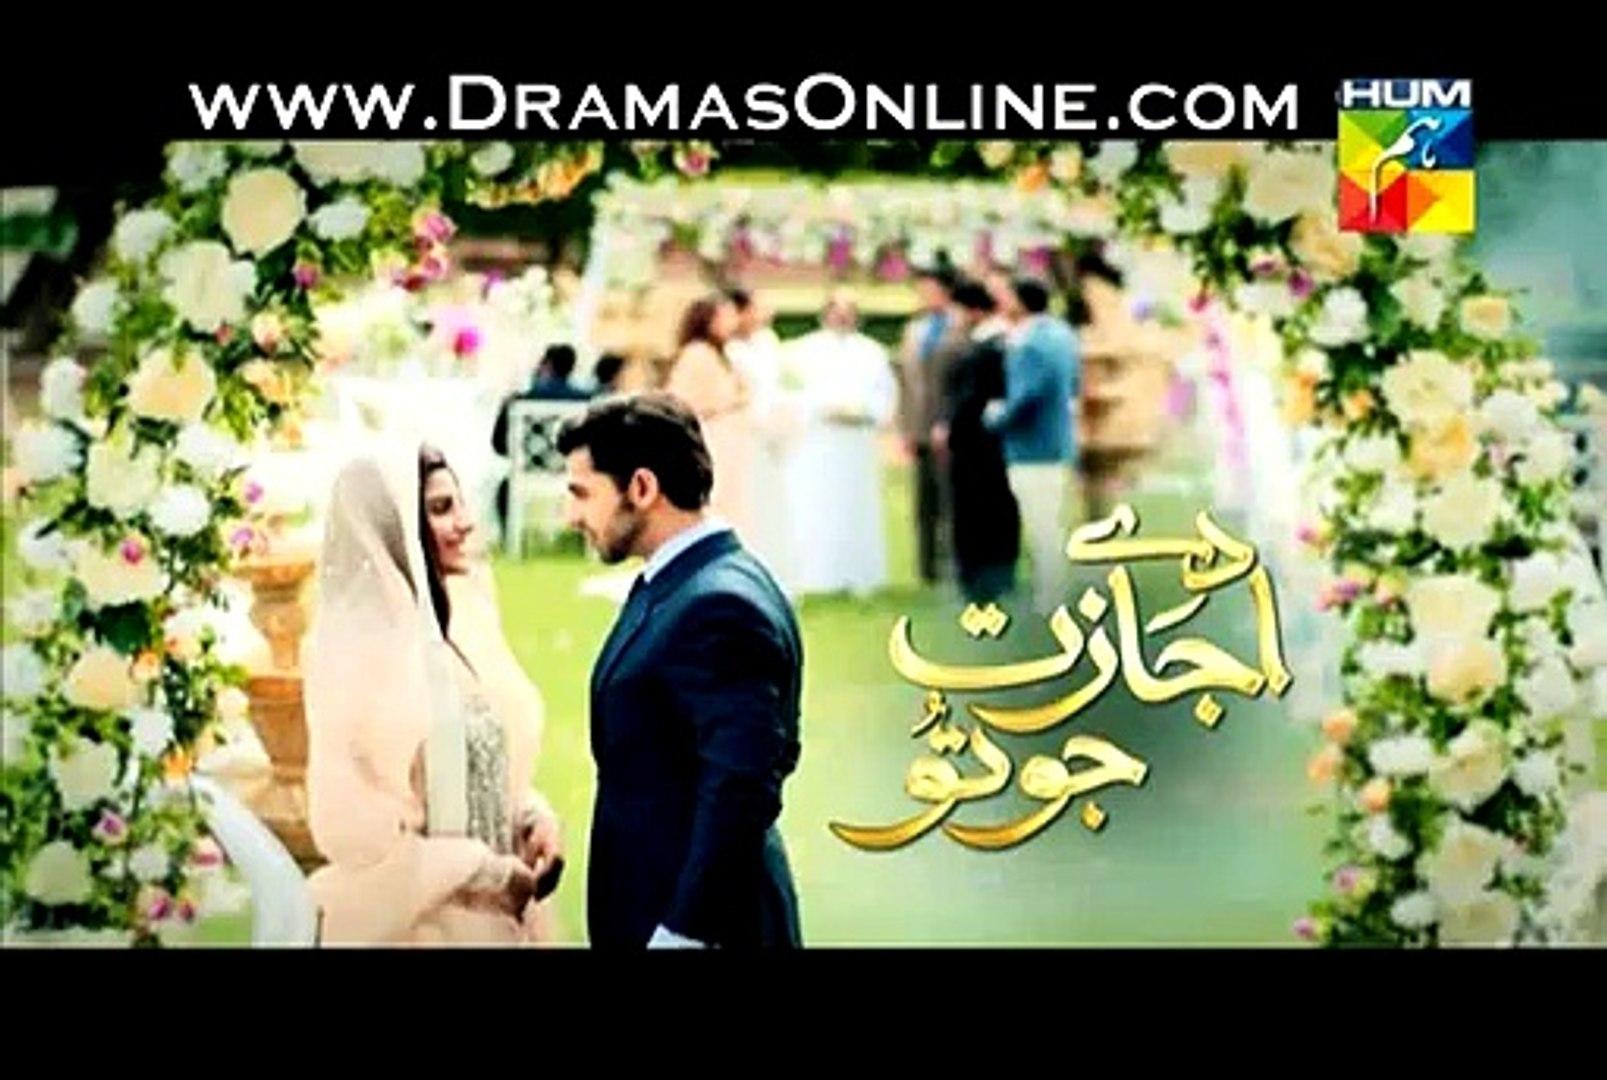 Daay Ijazat Jo Tu Episode 15 Full - Hum Tv in High Quality 8th December 2014